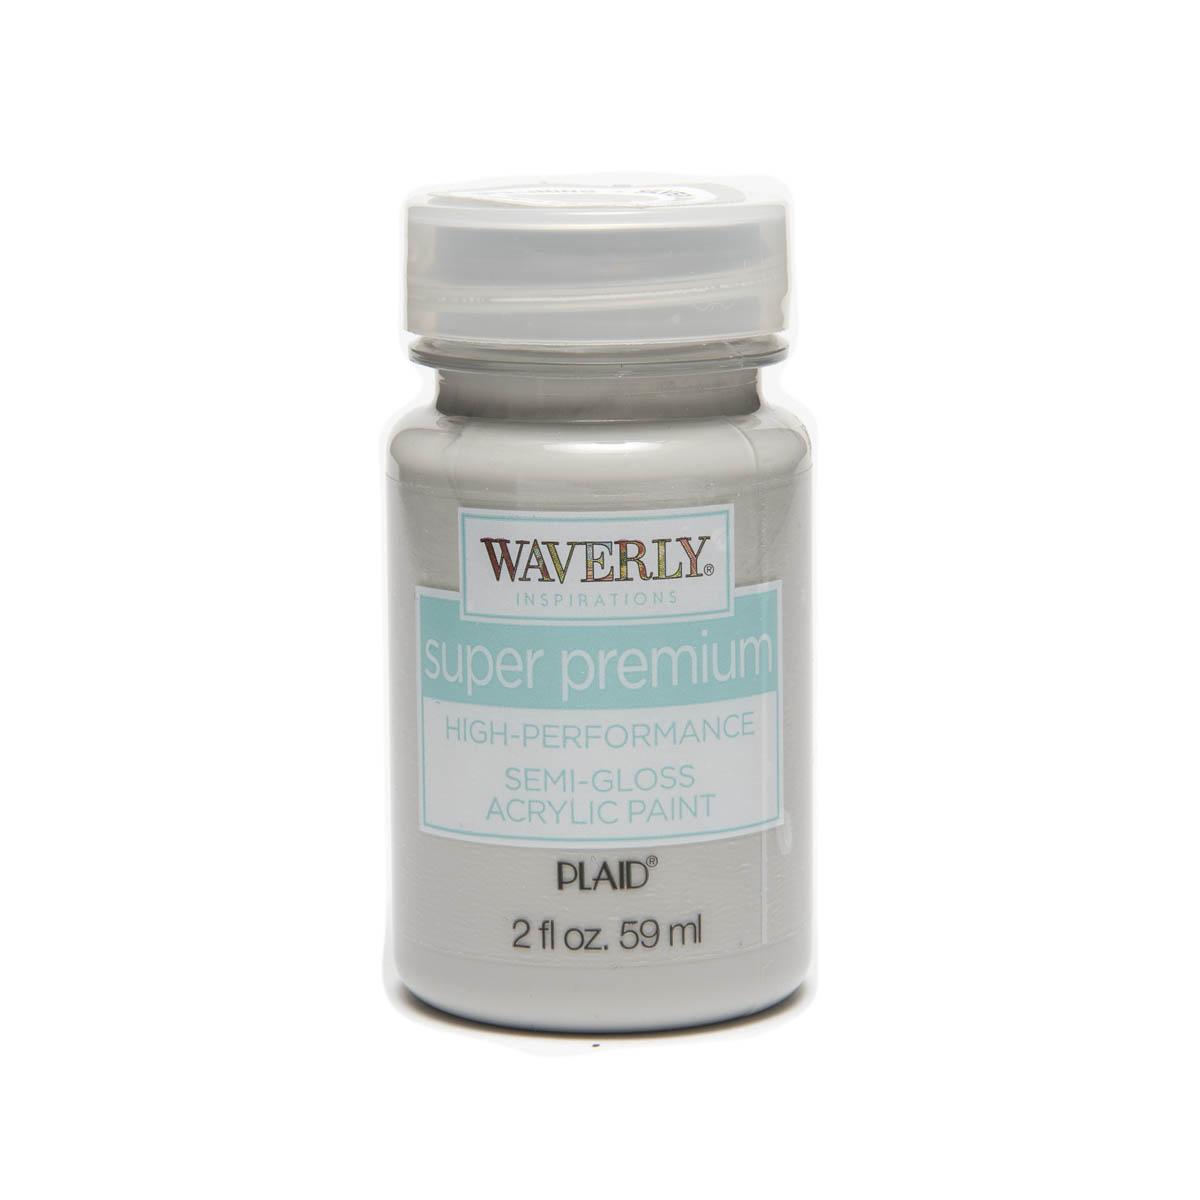 Waverly ® Inspirations Super Premium Semi-Gloss Acrylic Paint - Silver Lining, 2 oz. - 60657E